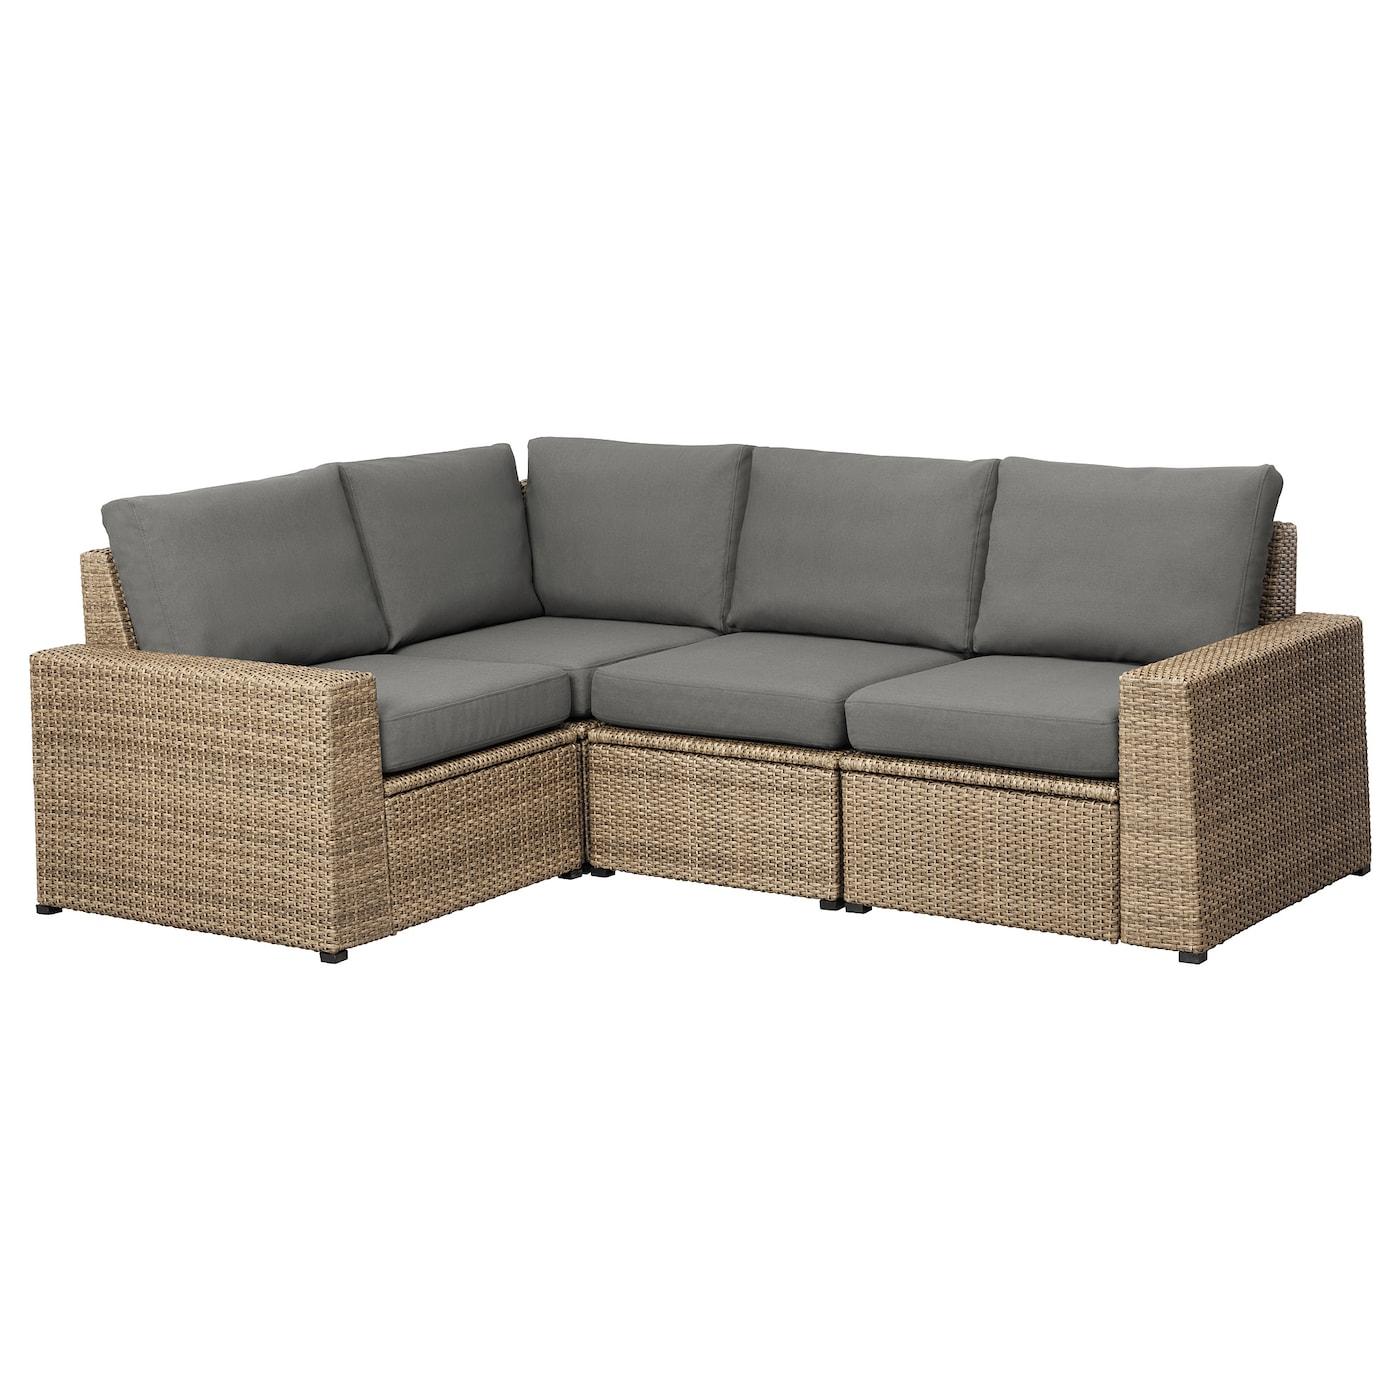 Ikea Corner Sofa Brown: SOLLERÖN Modular Corner Sofa 3-seat, Outdoor Brown/frösön